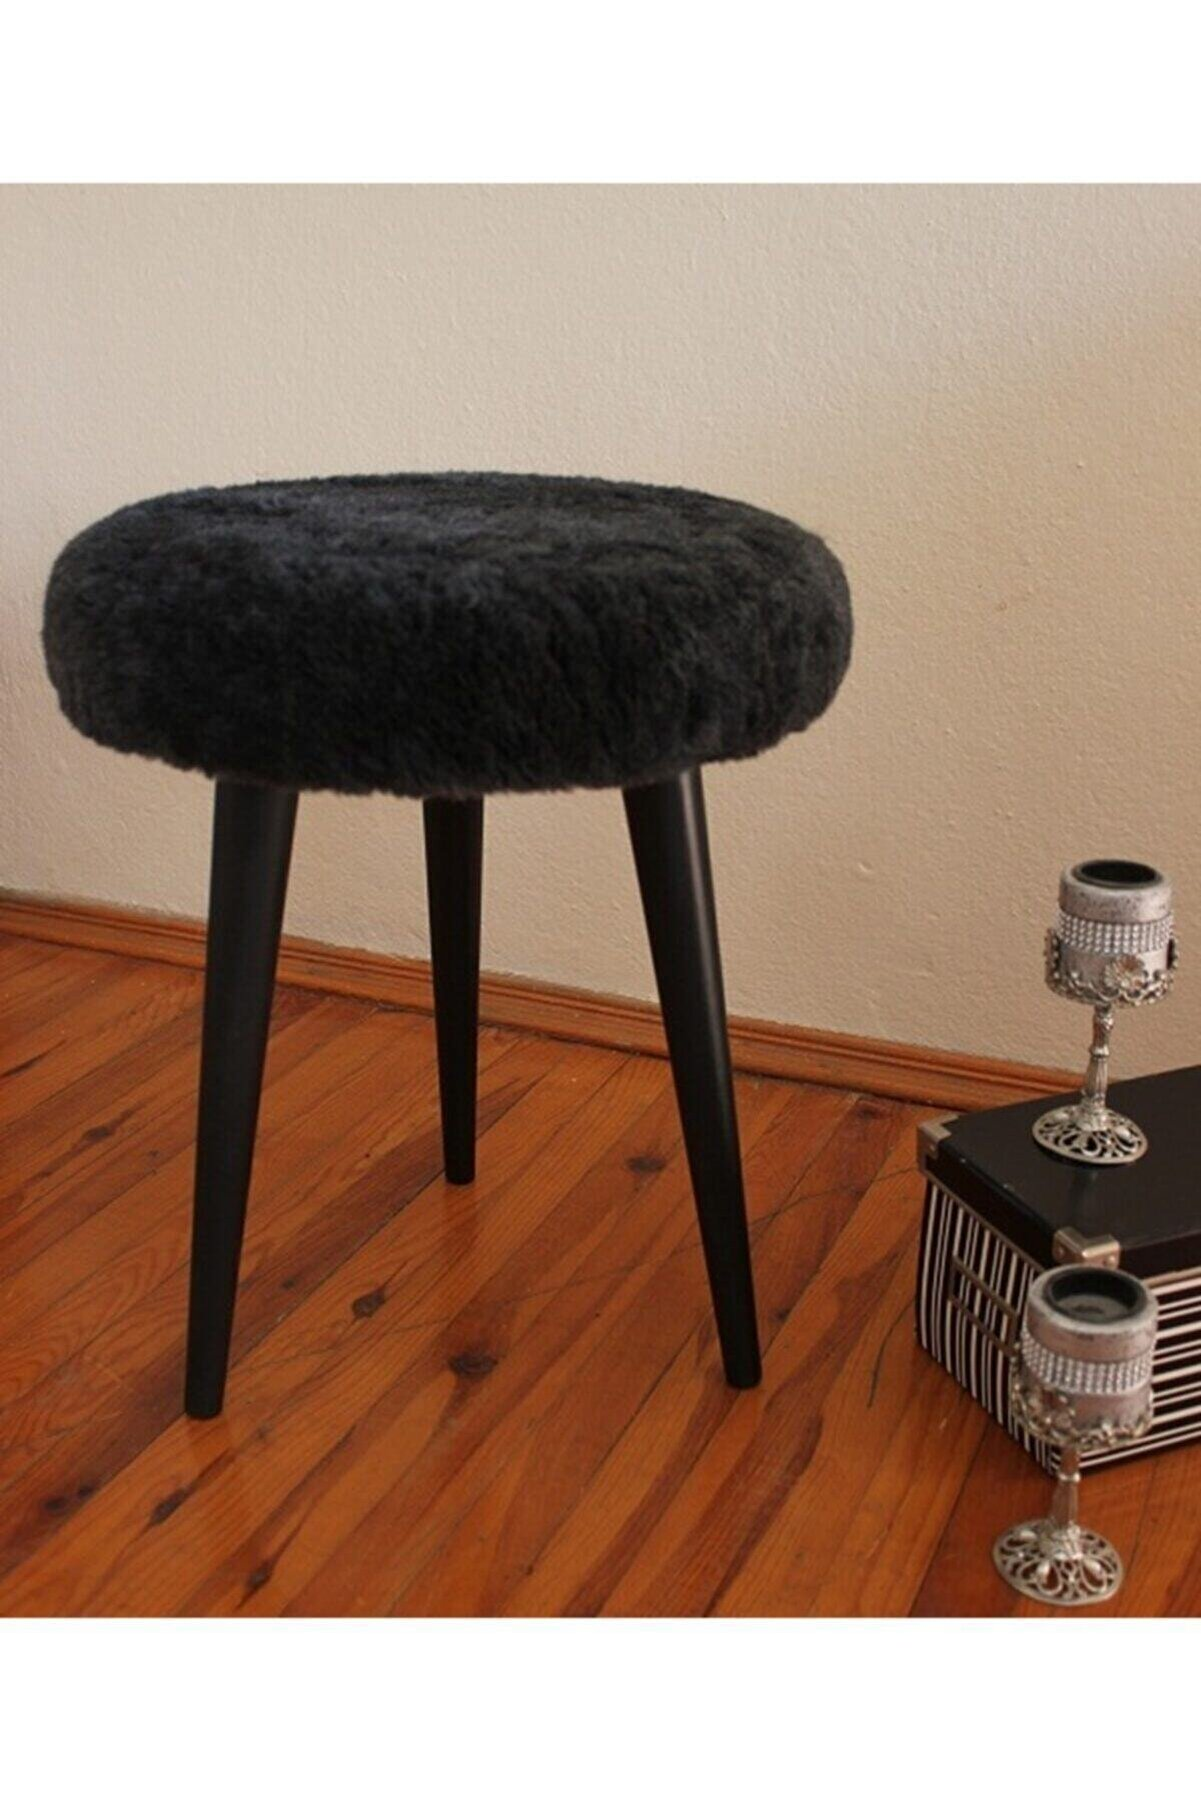 Neta Trade Neta Home Ahşap Ayak Dekoratif Antrasit Siyah Pelüş Puf Tabure Bench Yuvarlak Koltuk Sandalye